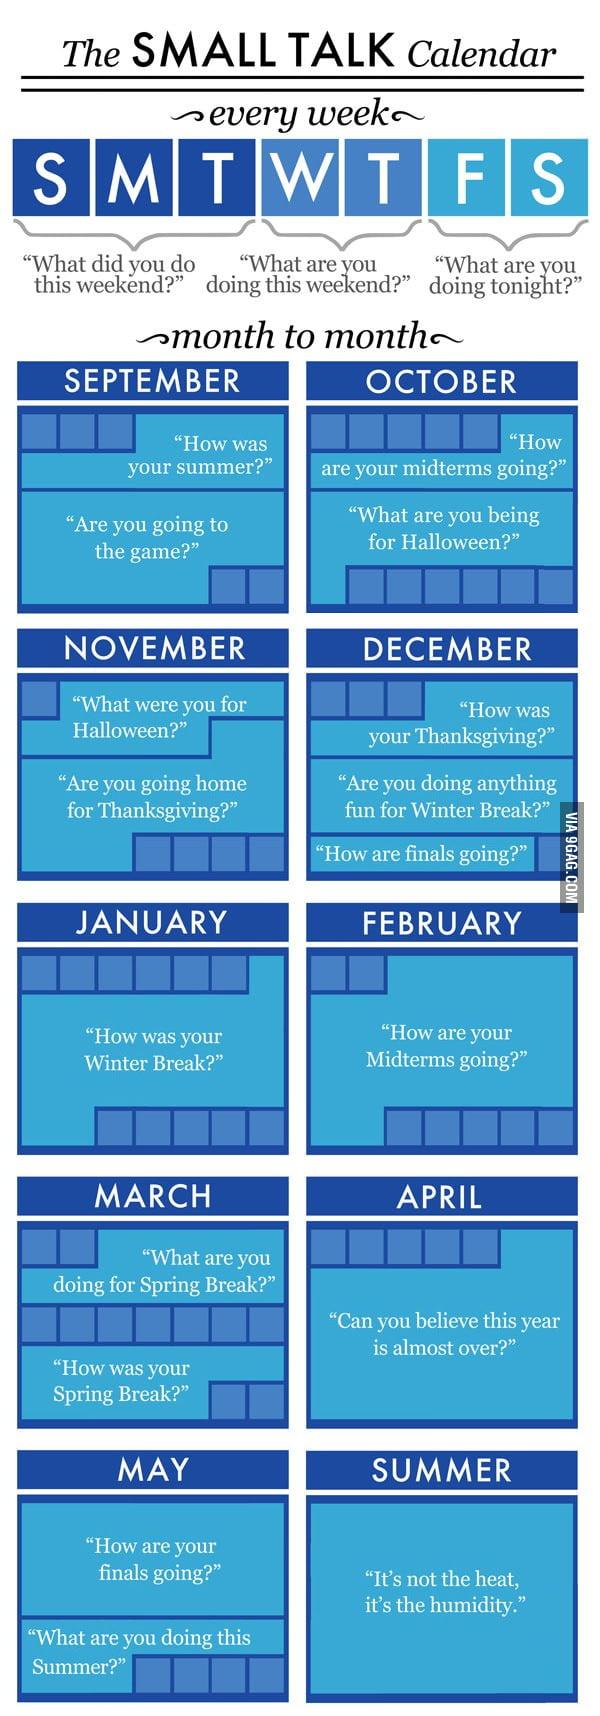 The Small Talk Calendar